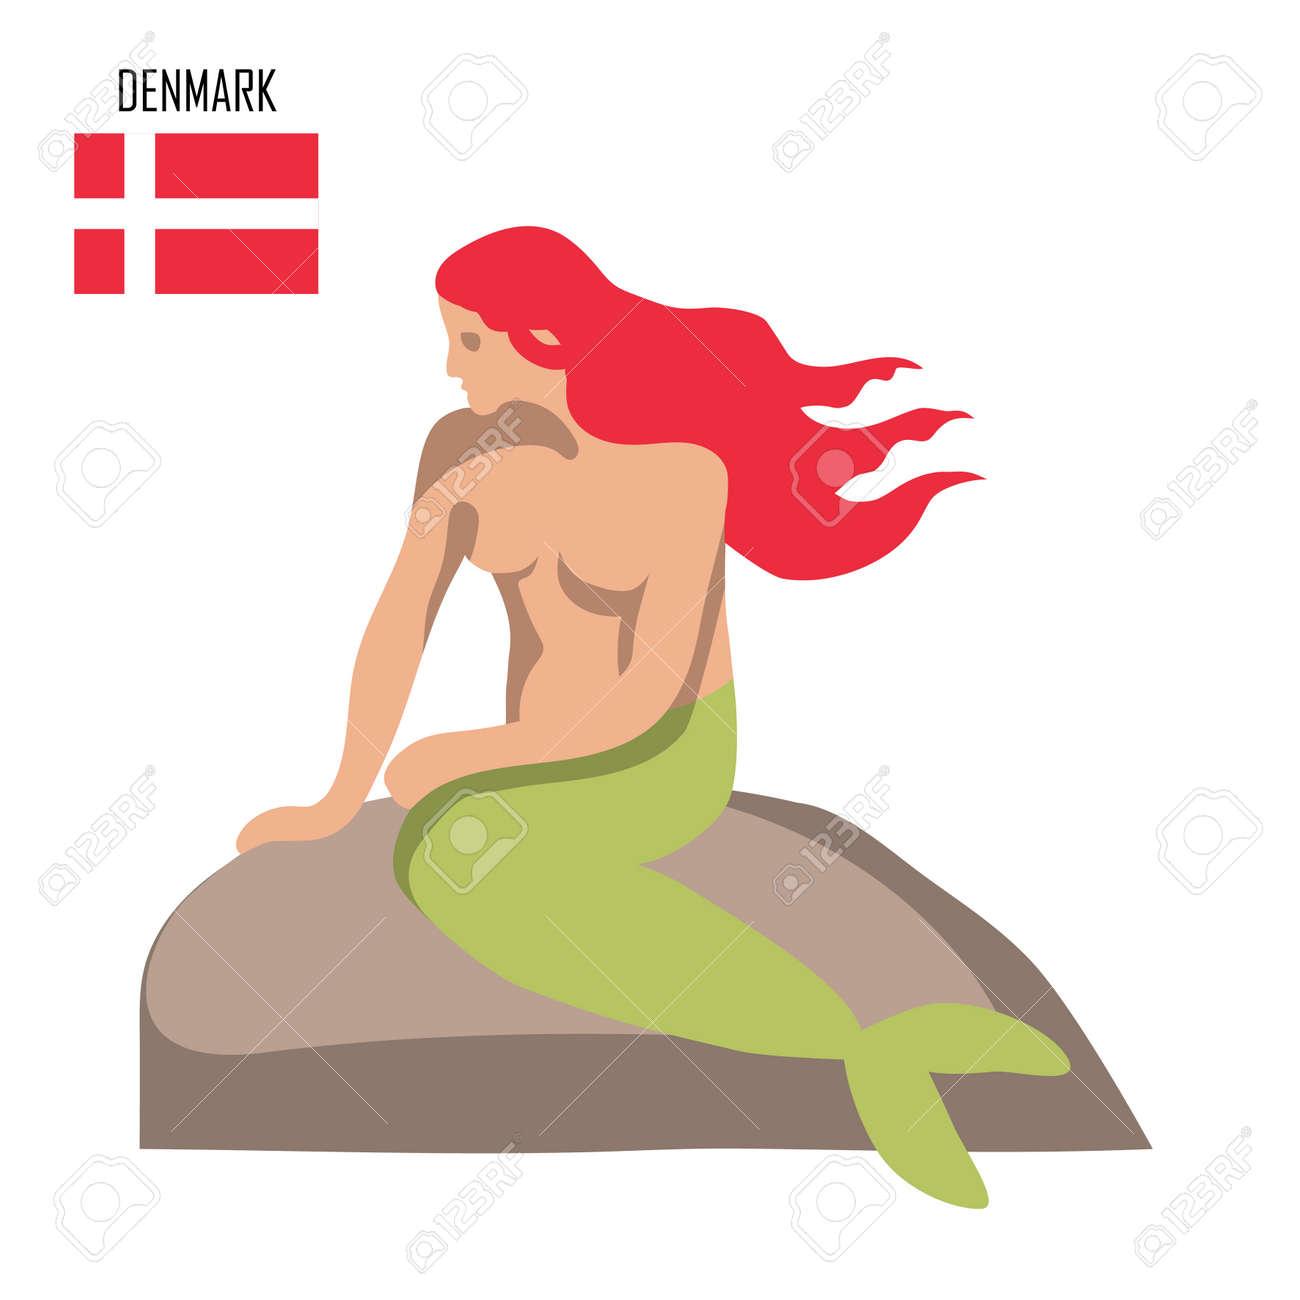 Little Mermaid, Copenhagen, Denmark | Stock Photo | 1300x1300